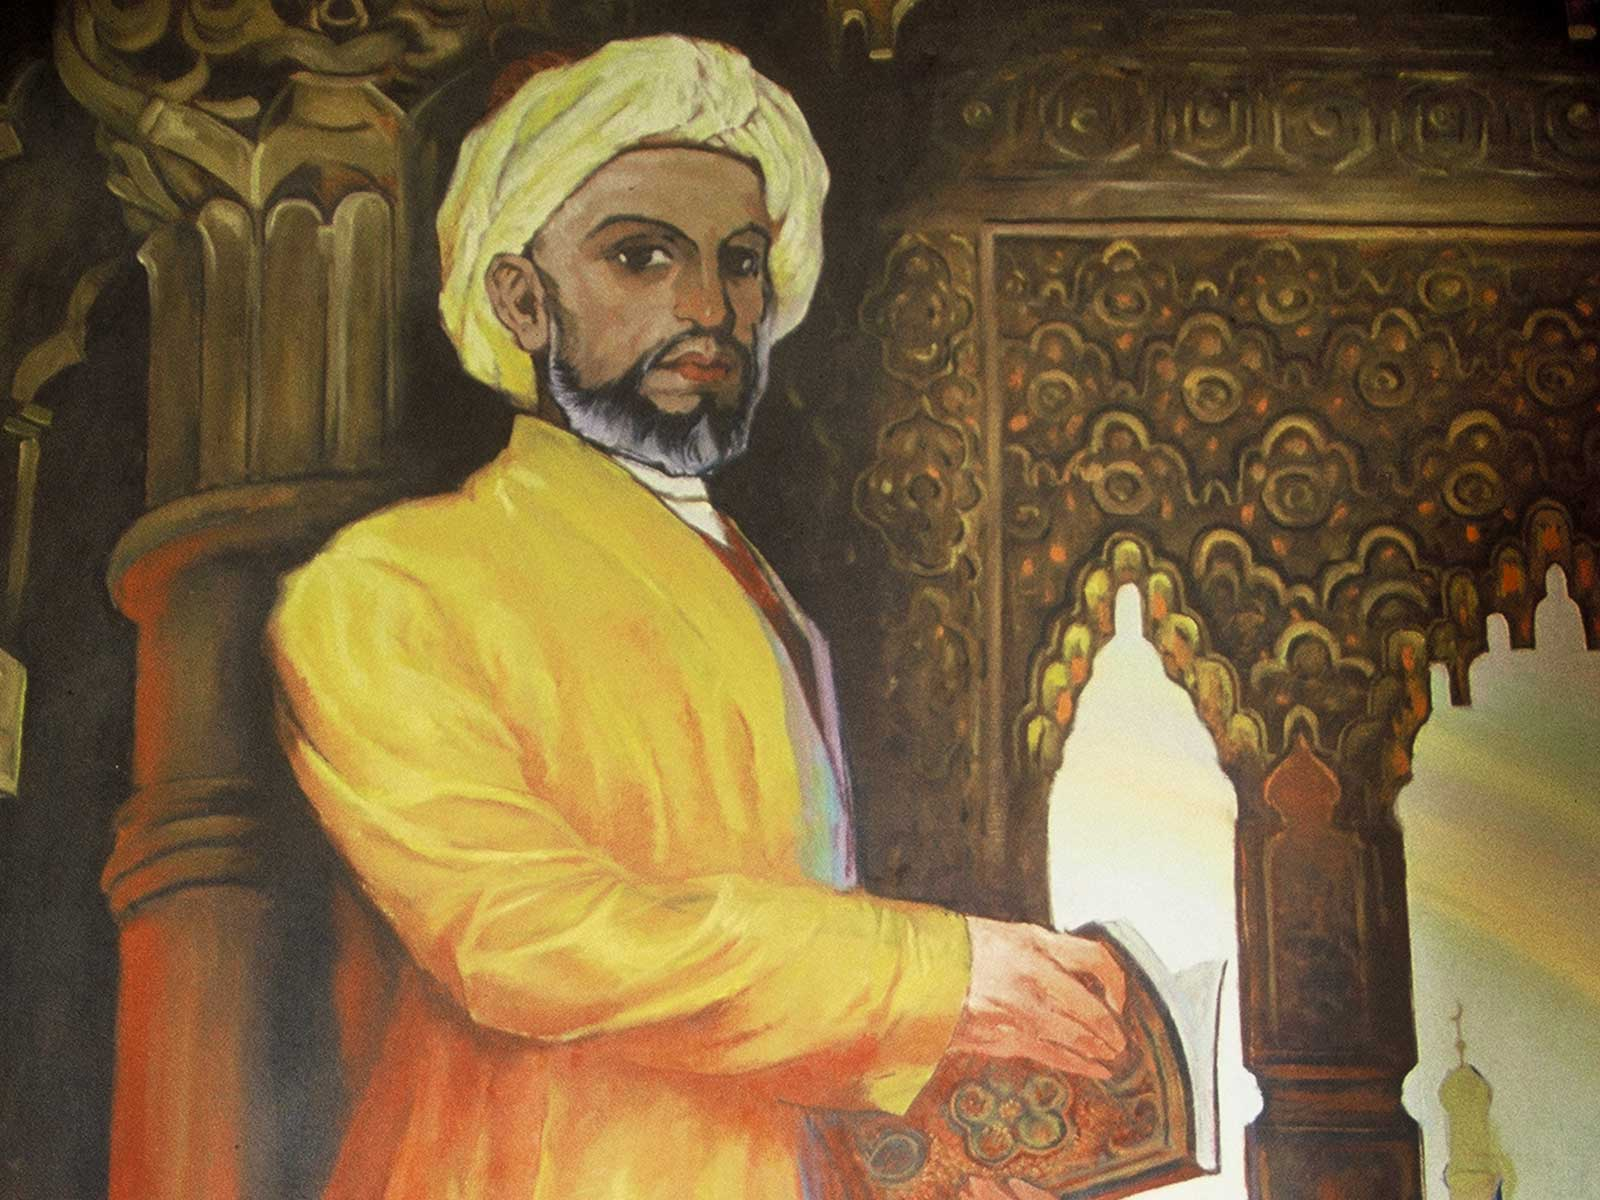 Yusuf Balasaguni - 11th century Islamic Philosopher - China Silk Road - Steven Andrew Martin PhD - Study Abroad Photo Journal